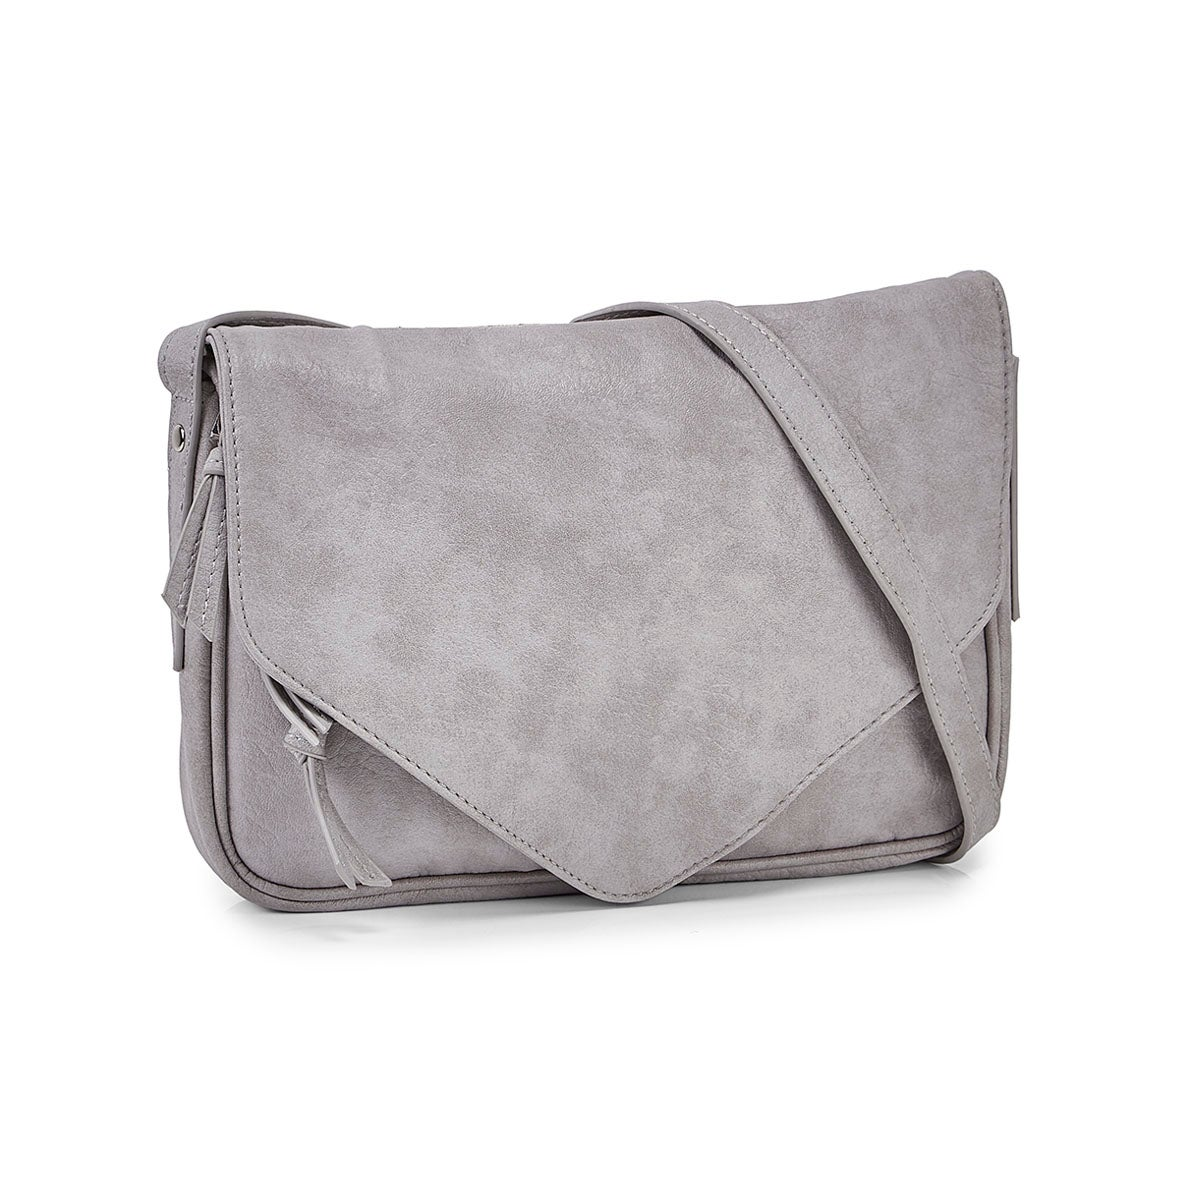 Women's 6353 Crossbody Bag - Grey